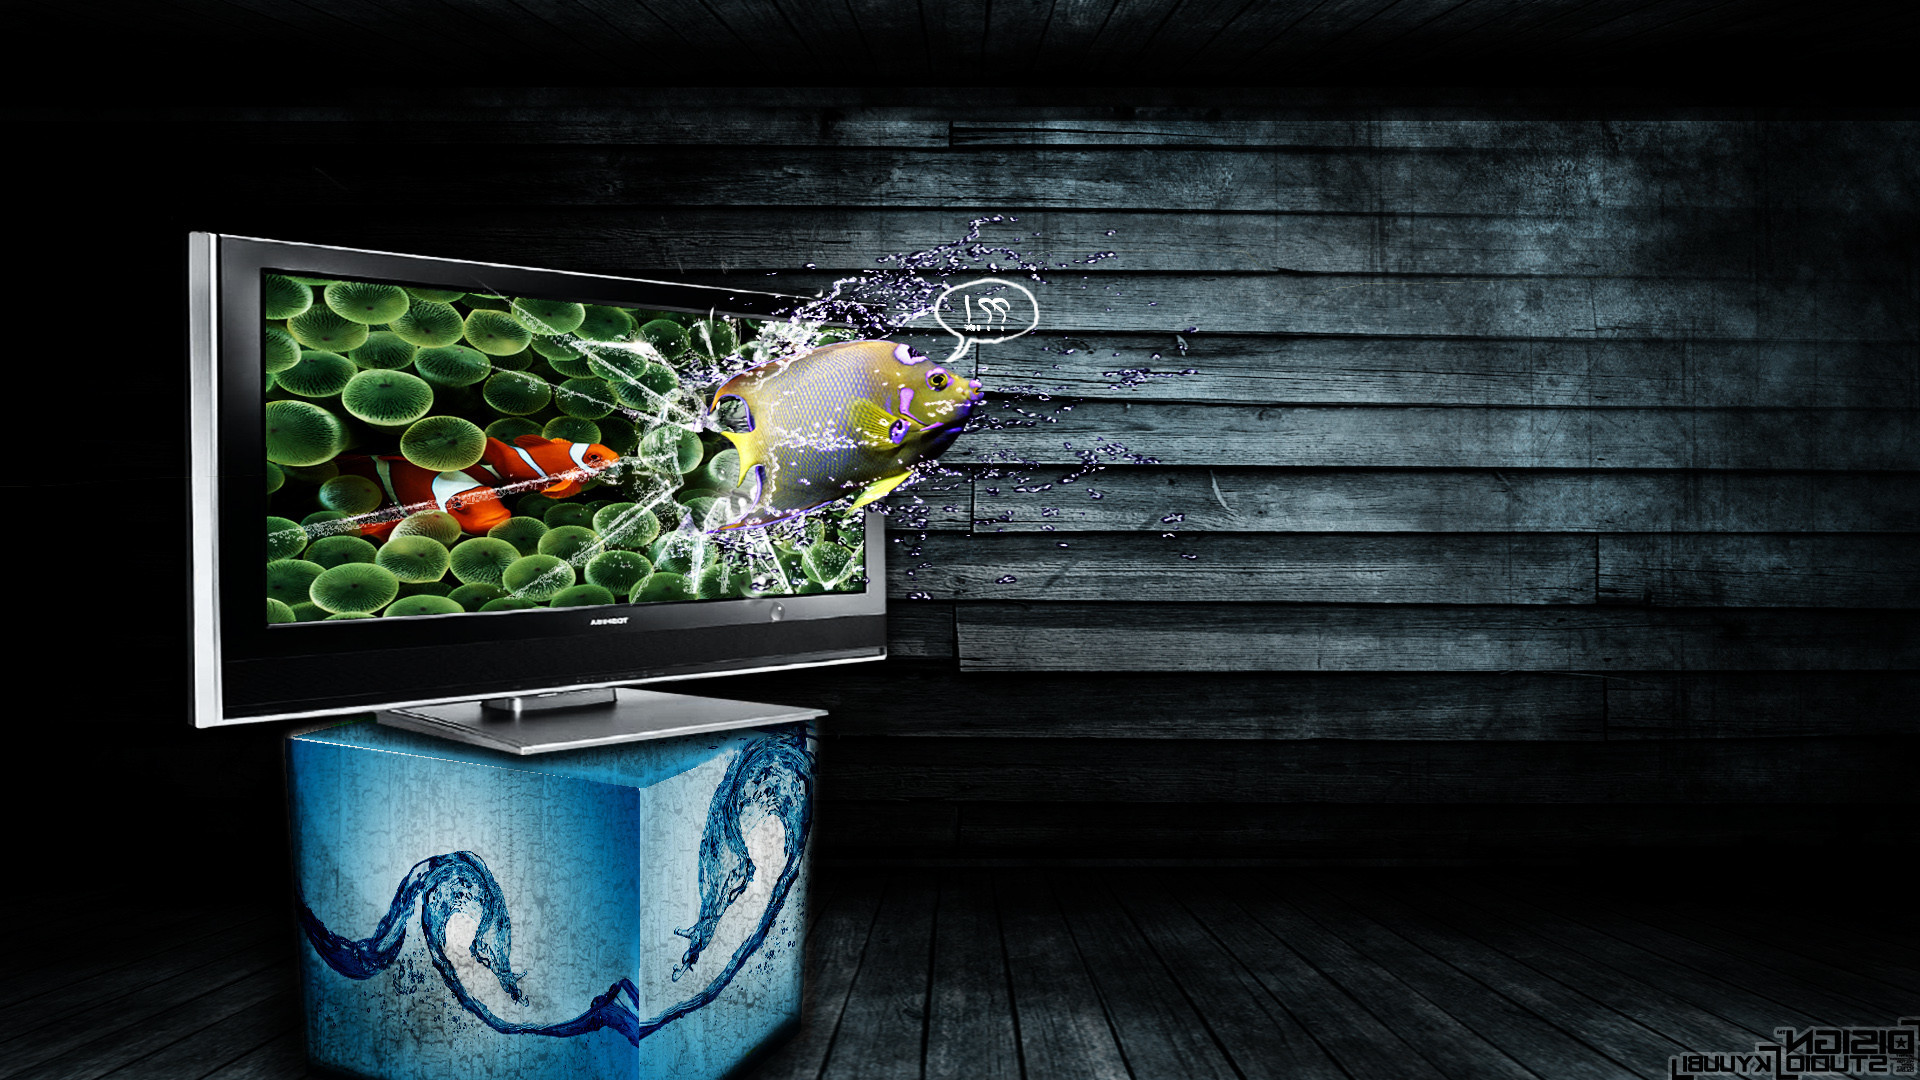 3d wallpaper hd widescreen 1920×1080 pixel | ImgStocks.com